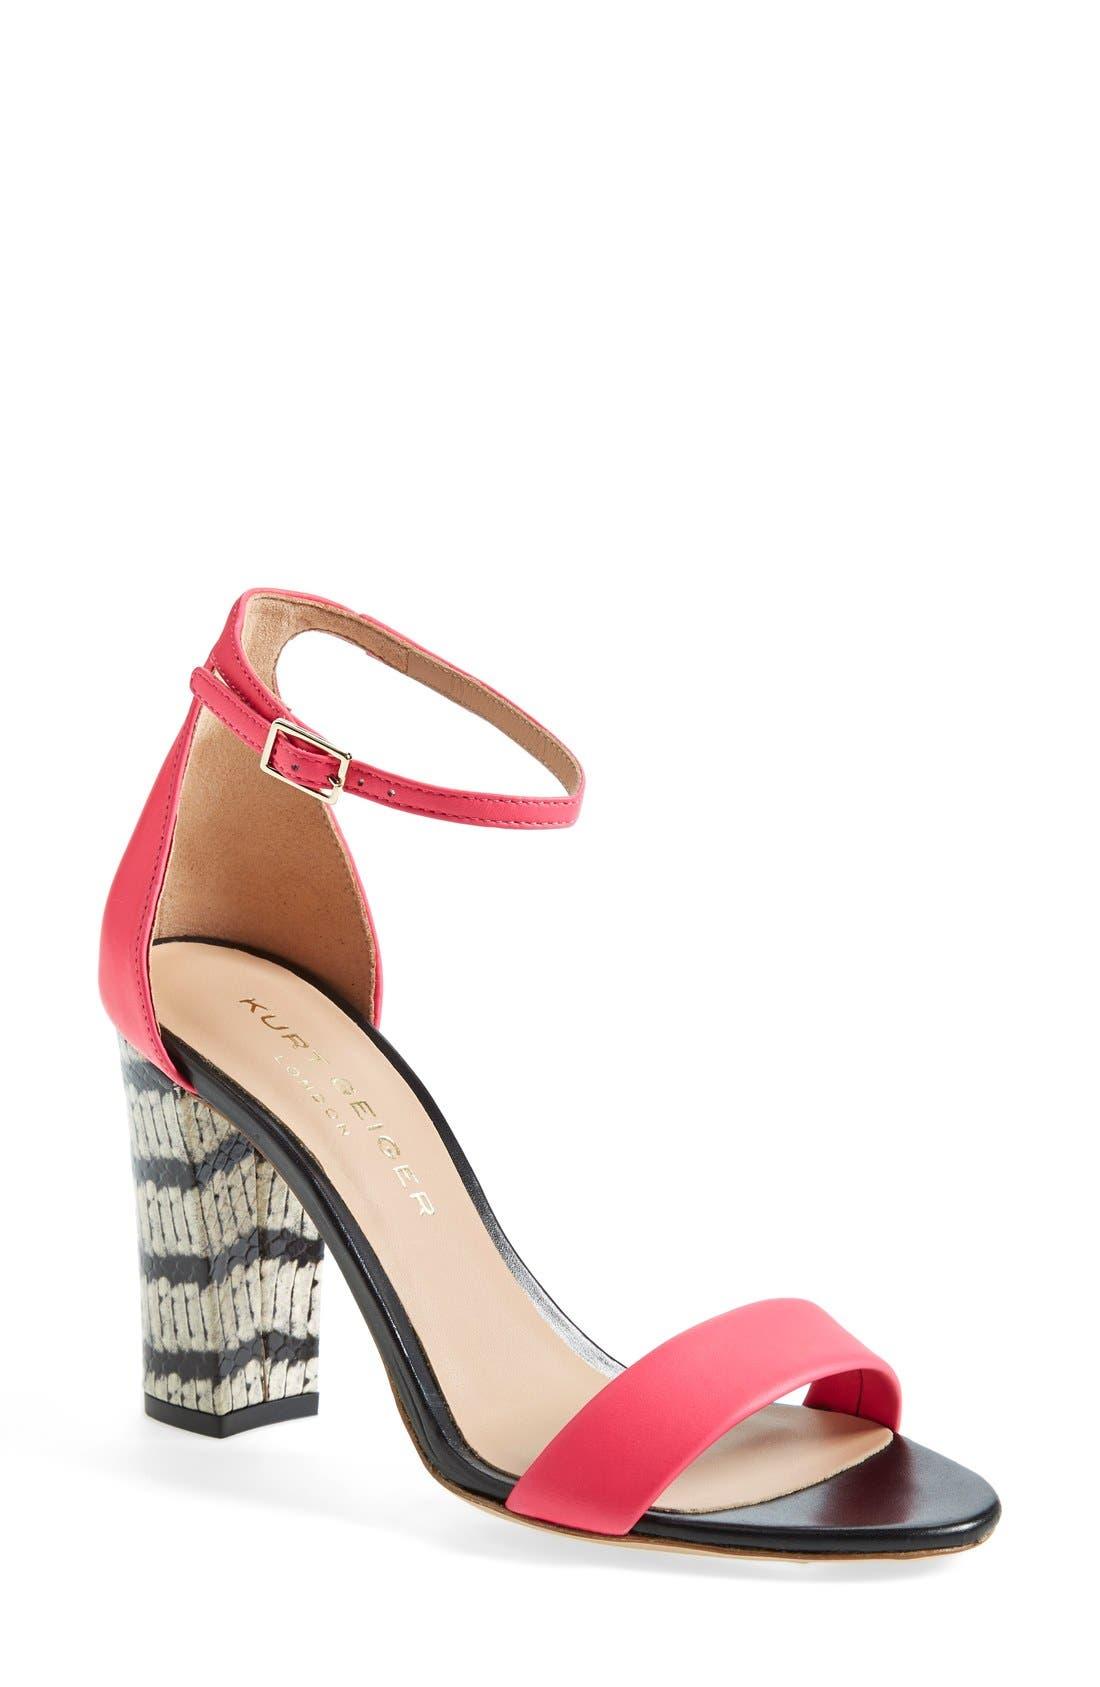 Main Image - Kurt Geiger London 'Isabella' Ankle Strap Sandal (Women)